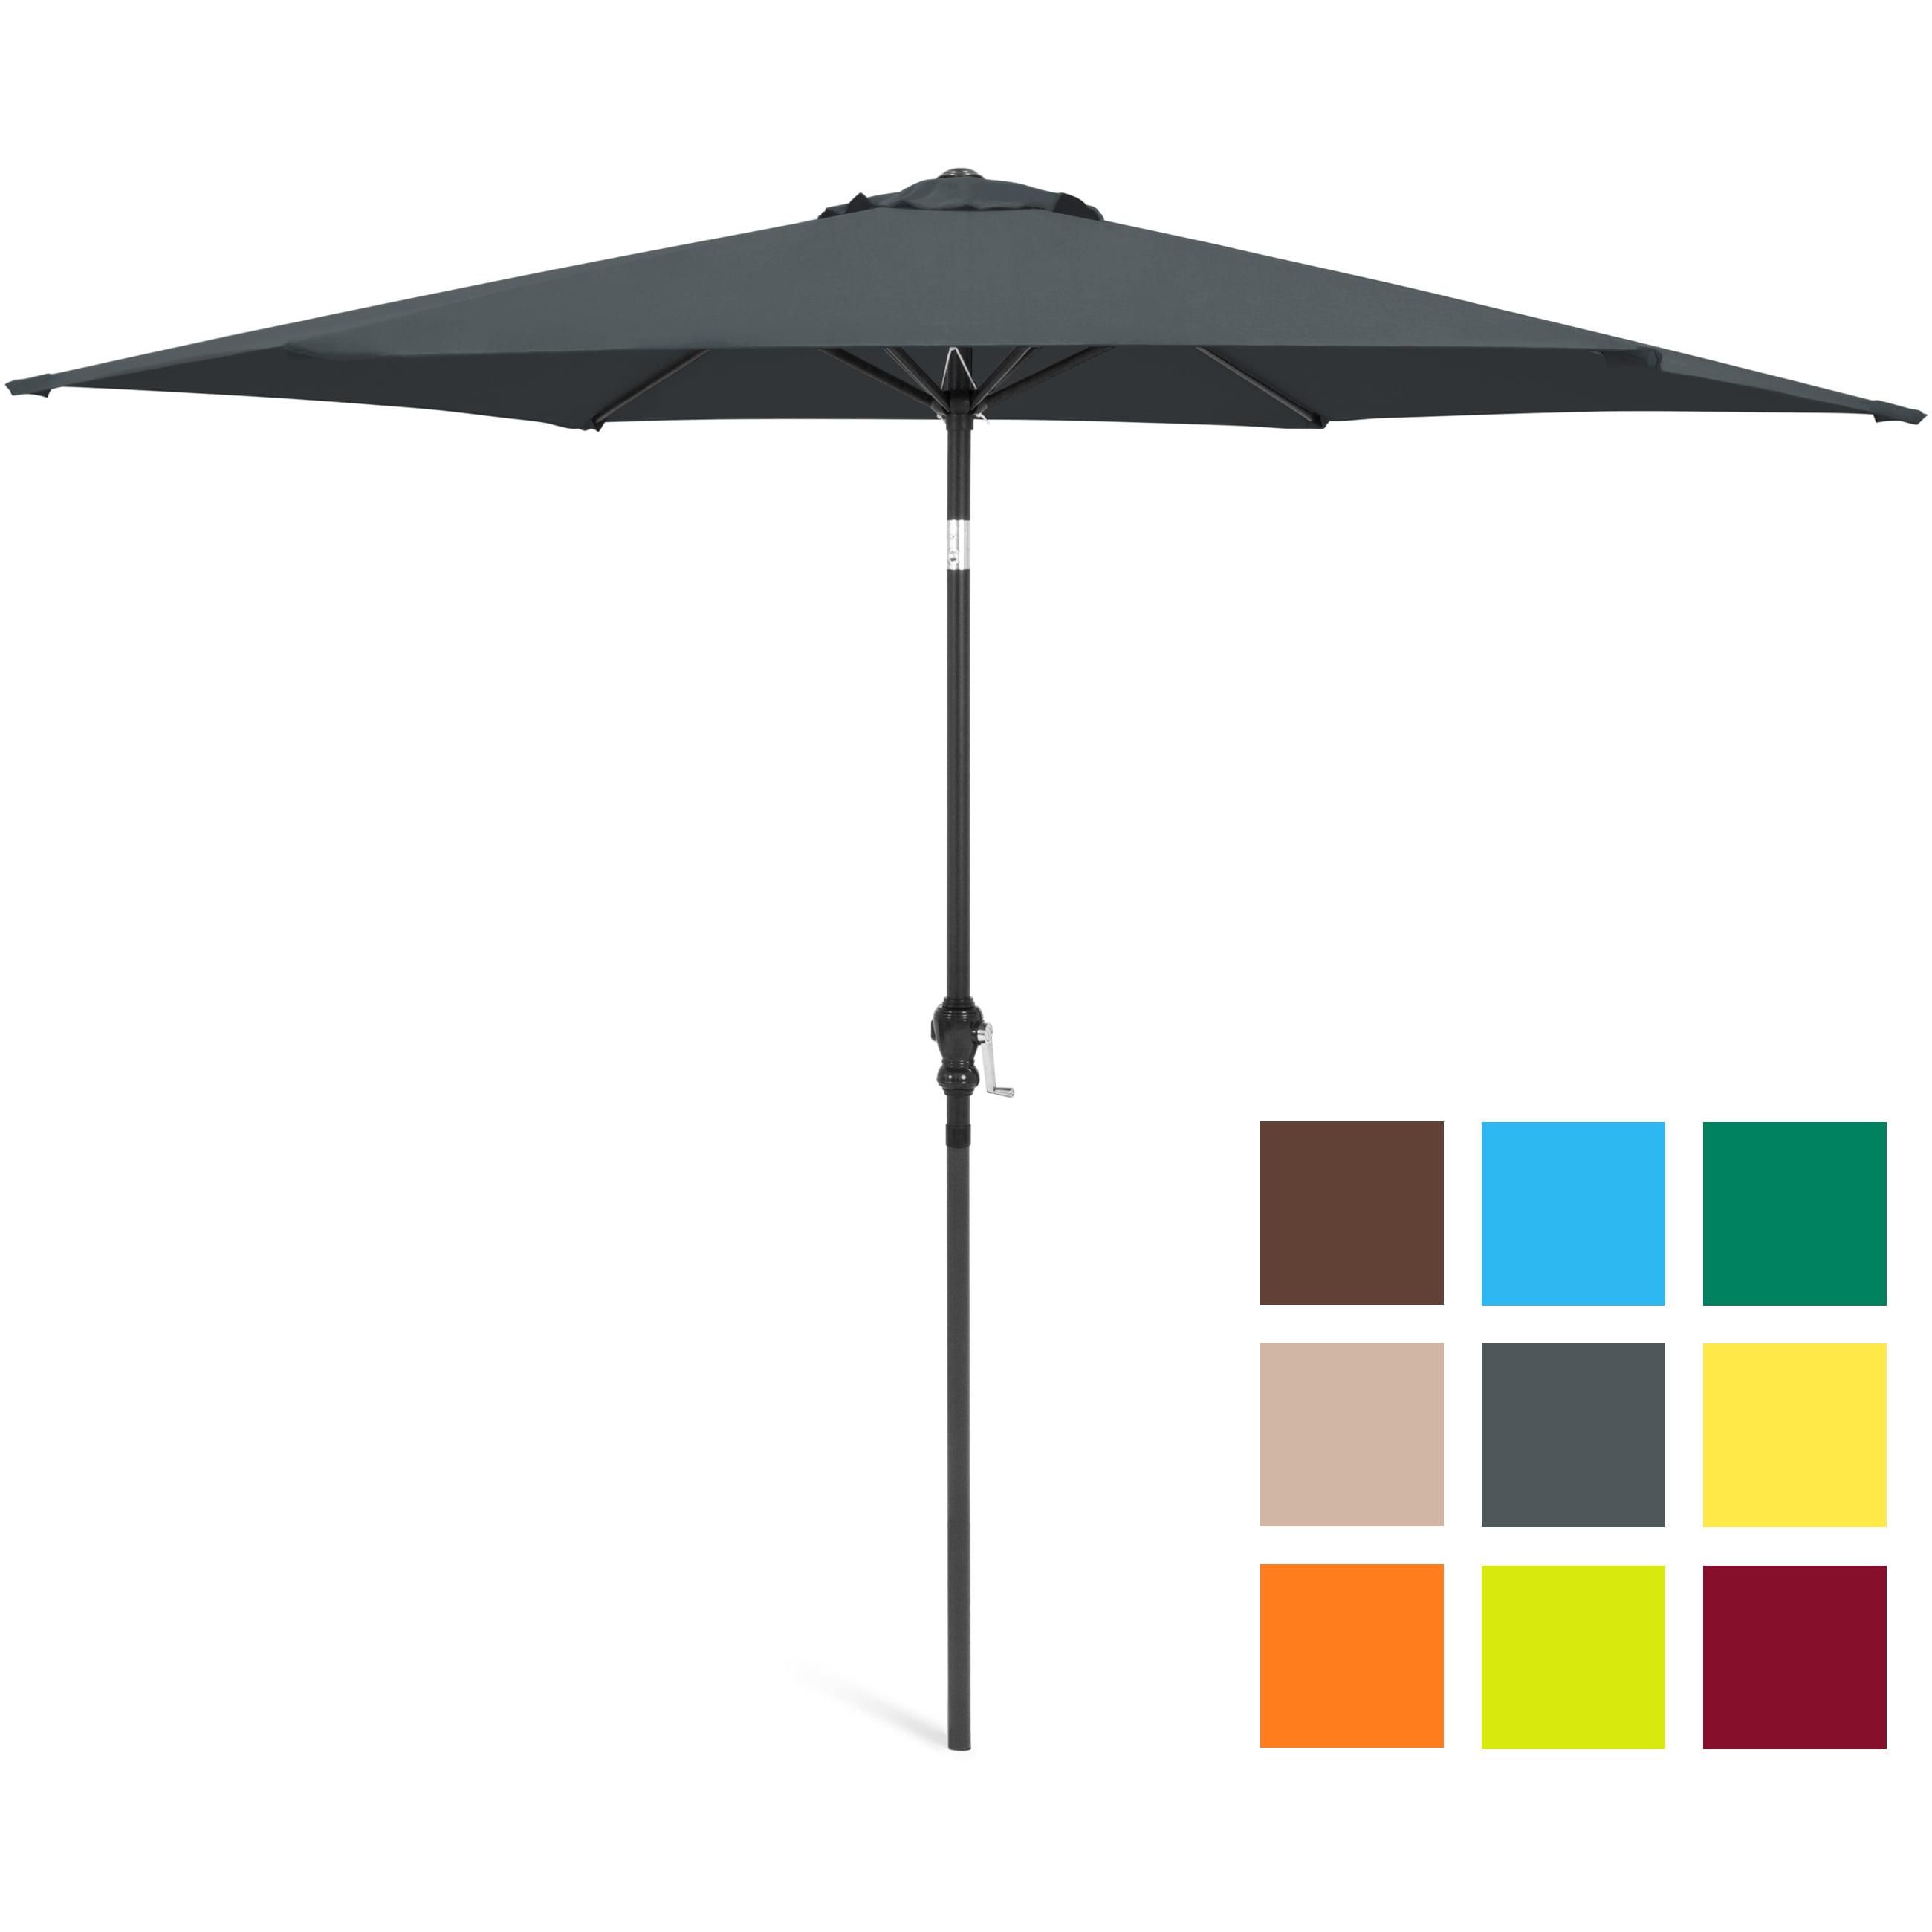 10FT Steel Market Outdoor Patio Umbrella Crank, Tilt Push Button Multiple Colors by